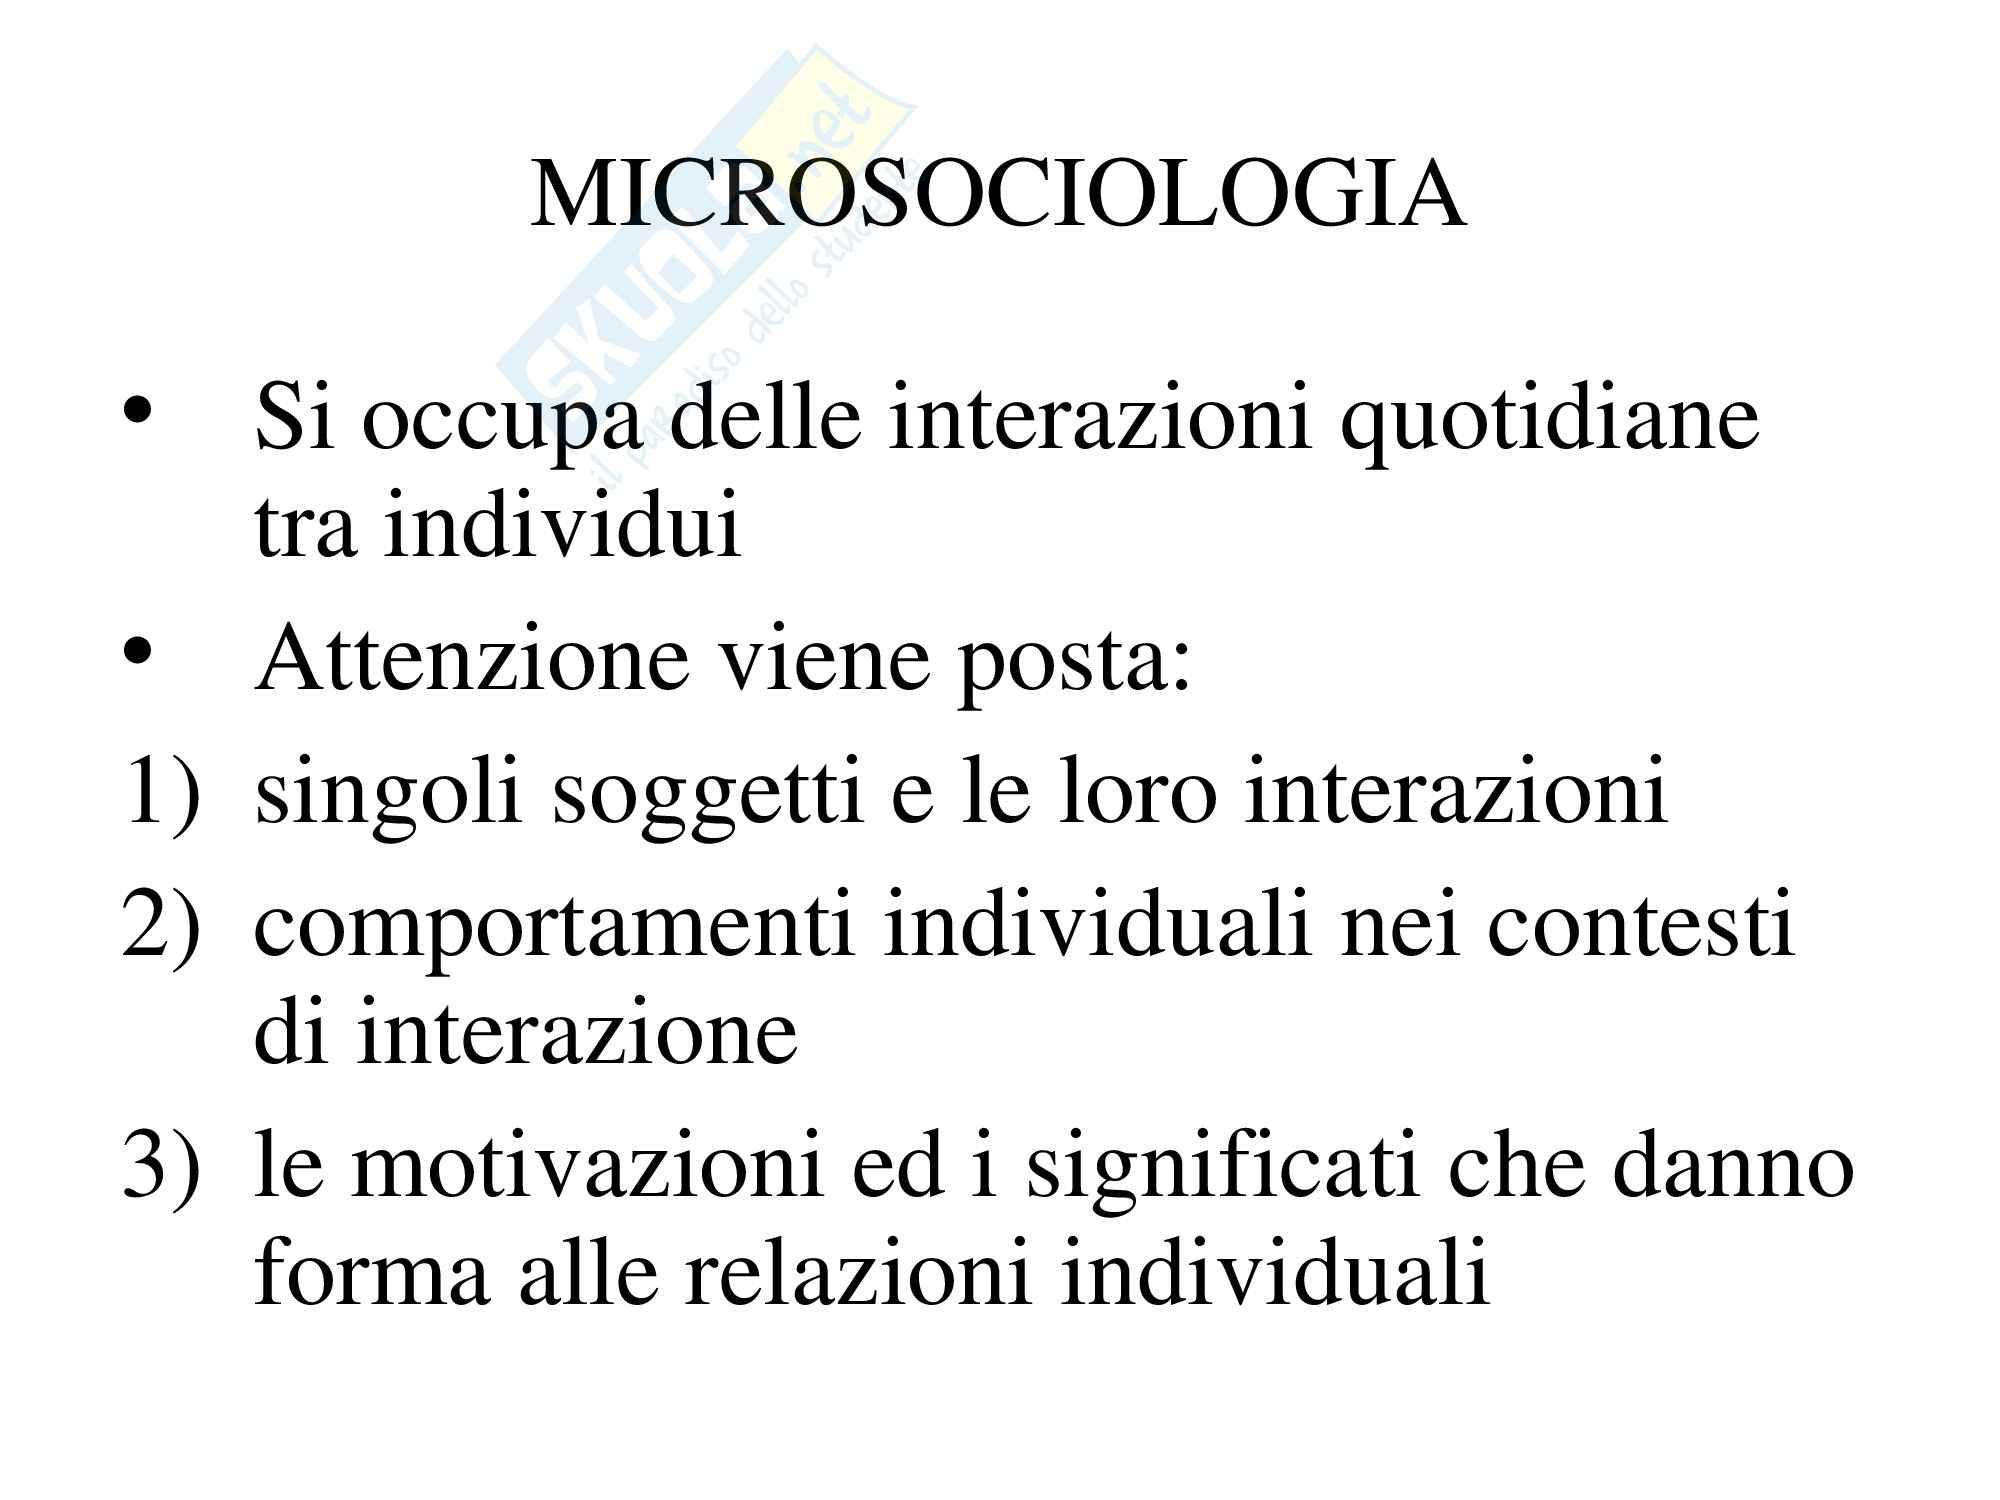 Microsociologia